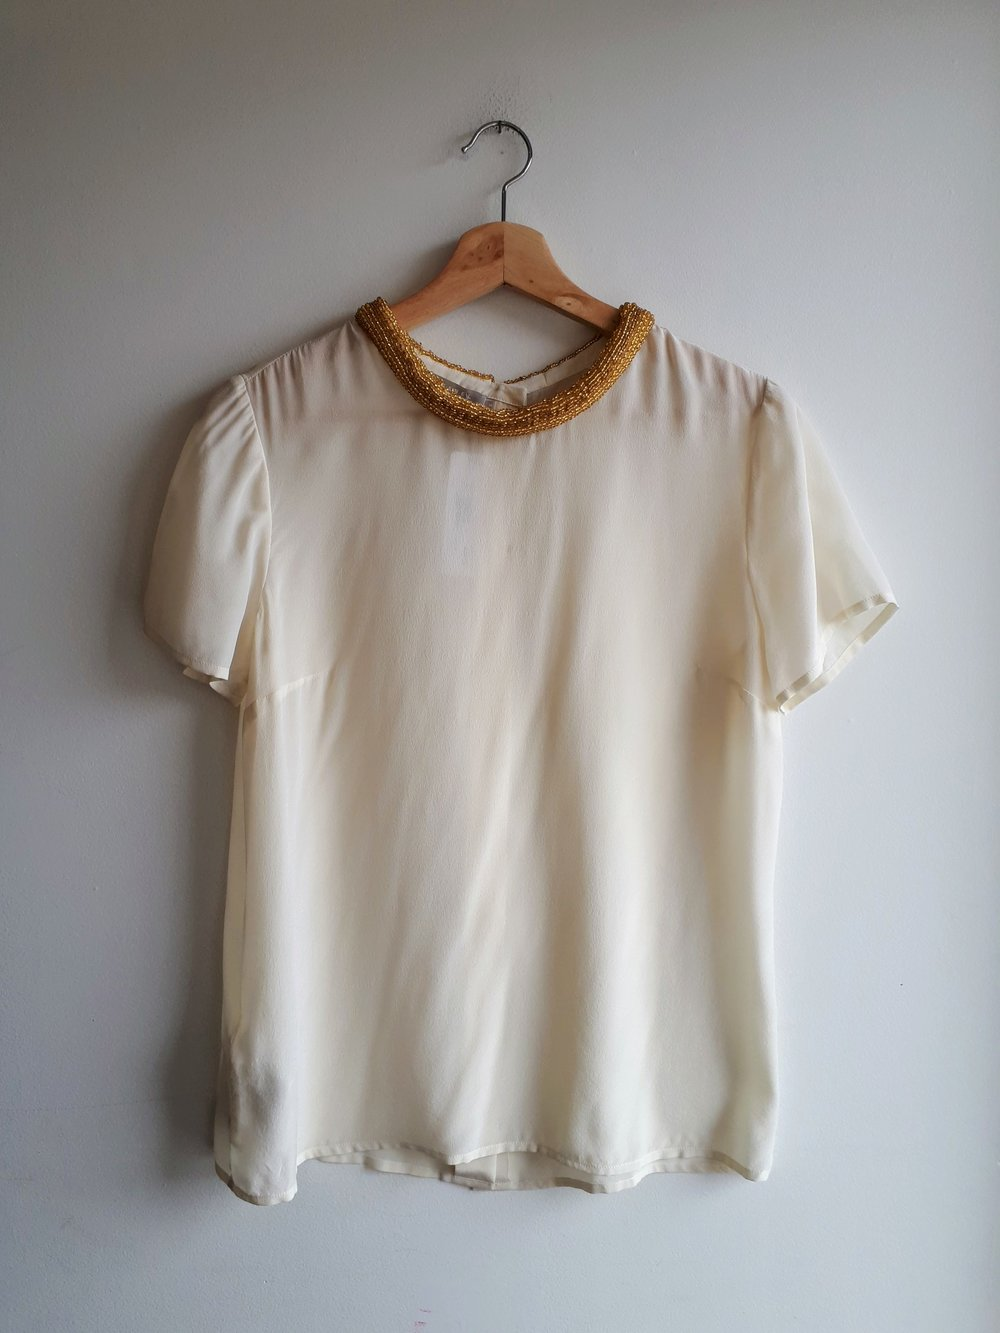 Stefanel top; Size M, $38